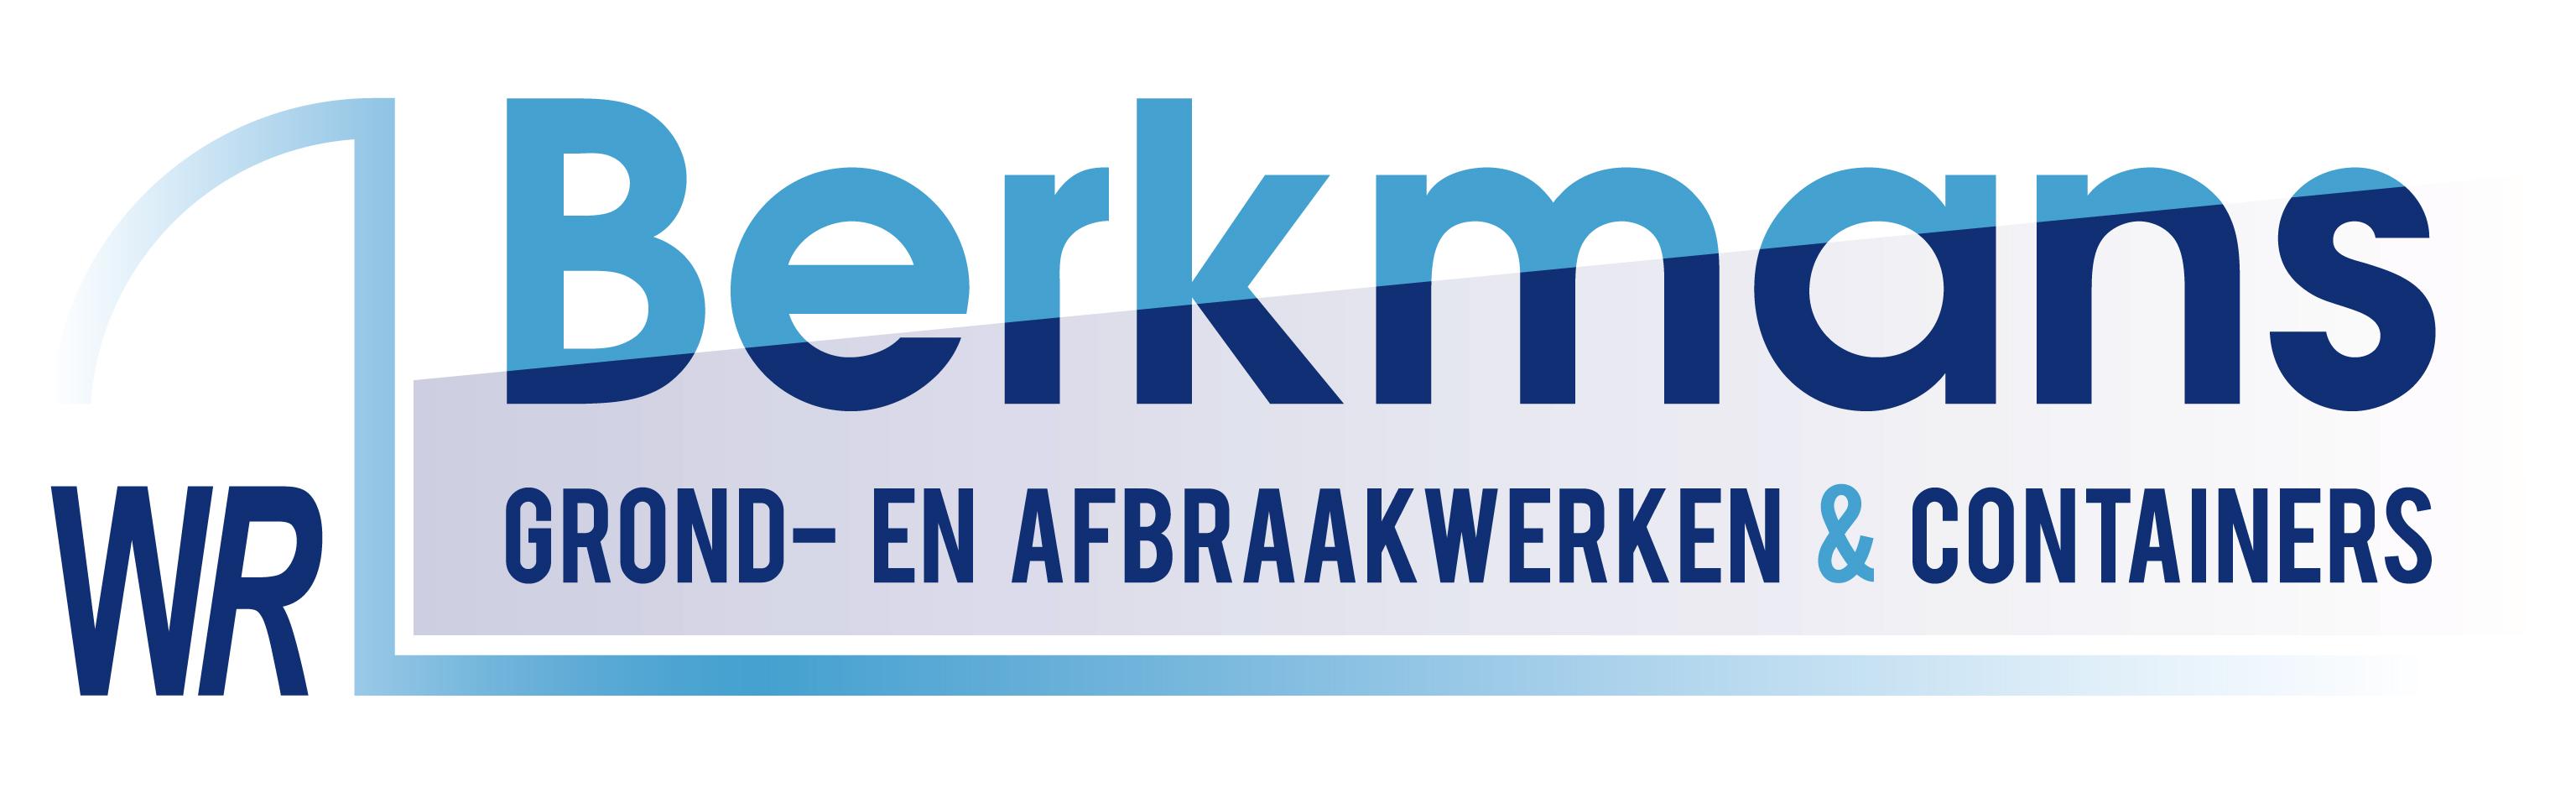 BERKMANS-LOGO-2013-A